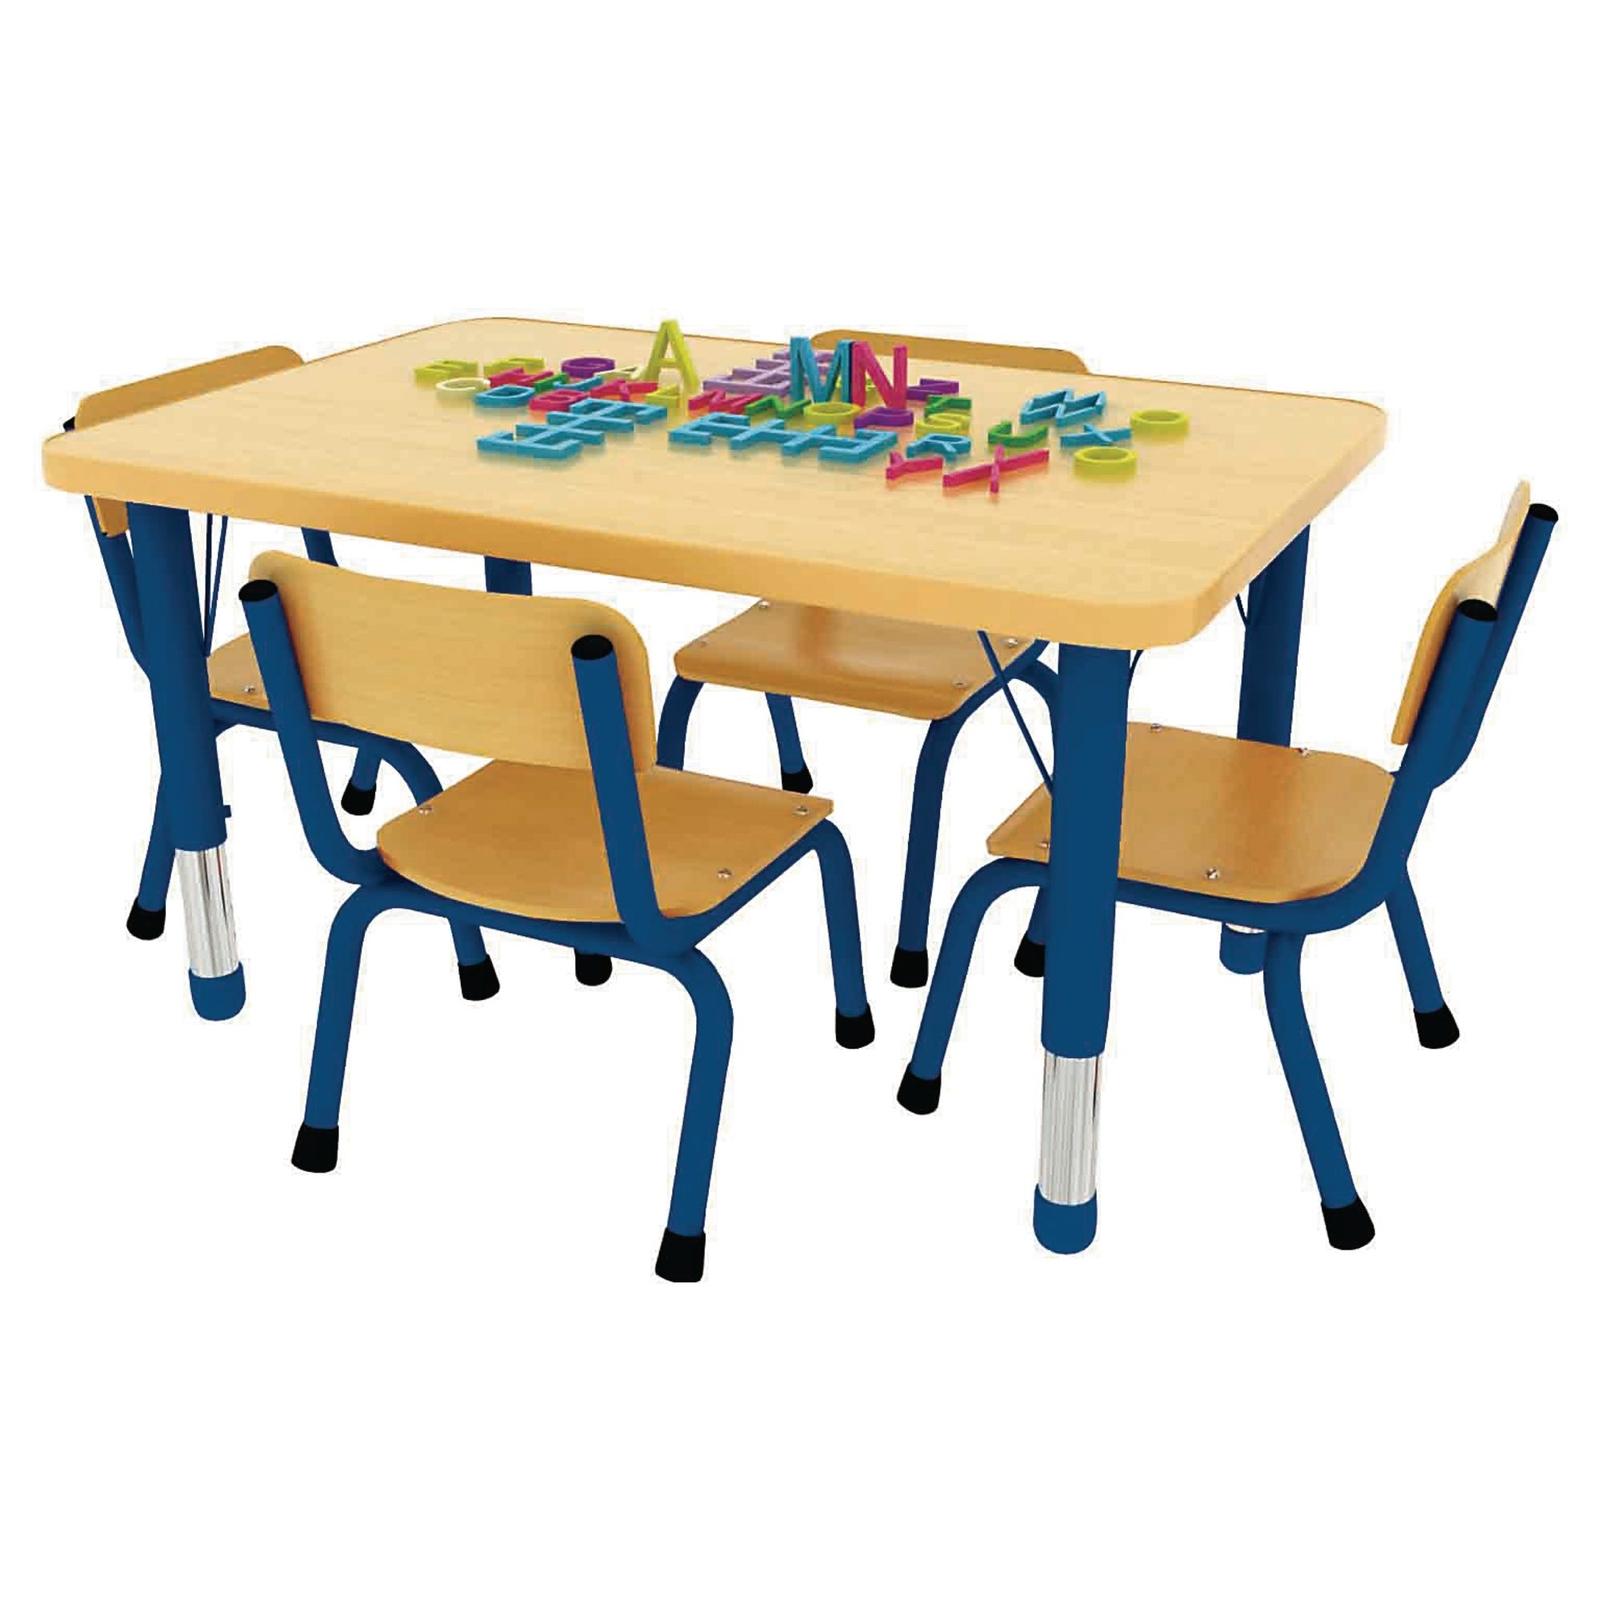 Milan Rectangular48mm Tubular Classroom Table - 900x600x370 to 620mm - Red